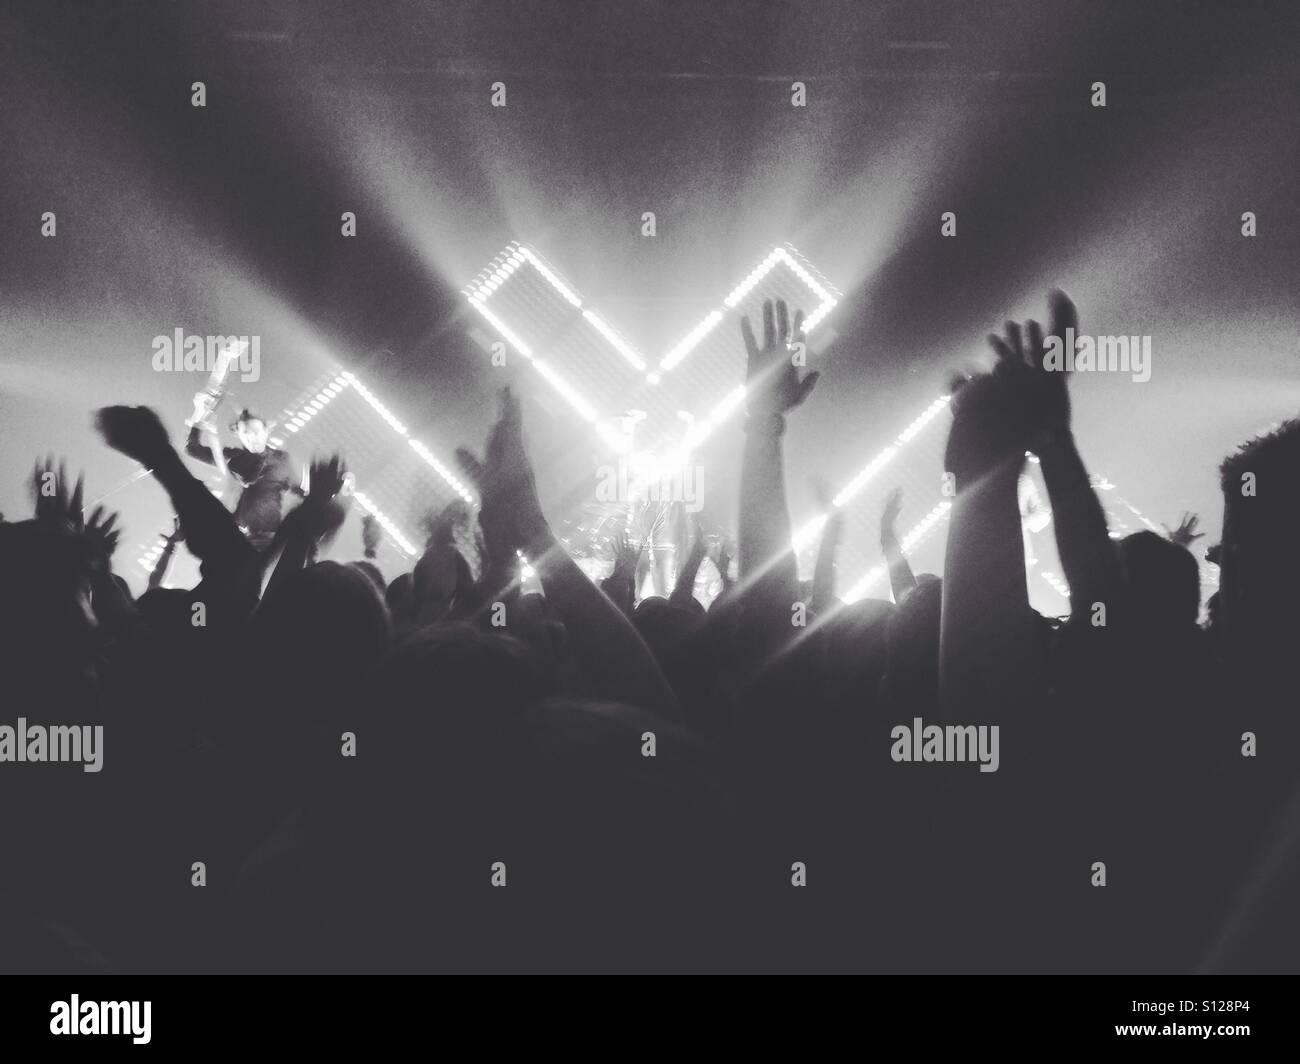 Metric in concert - Stock Image